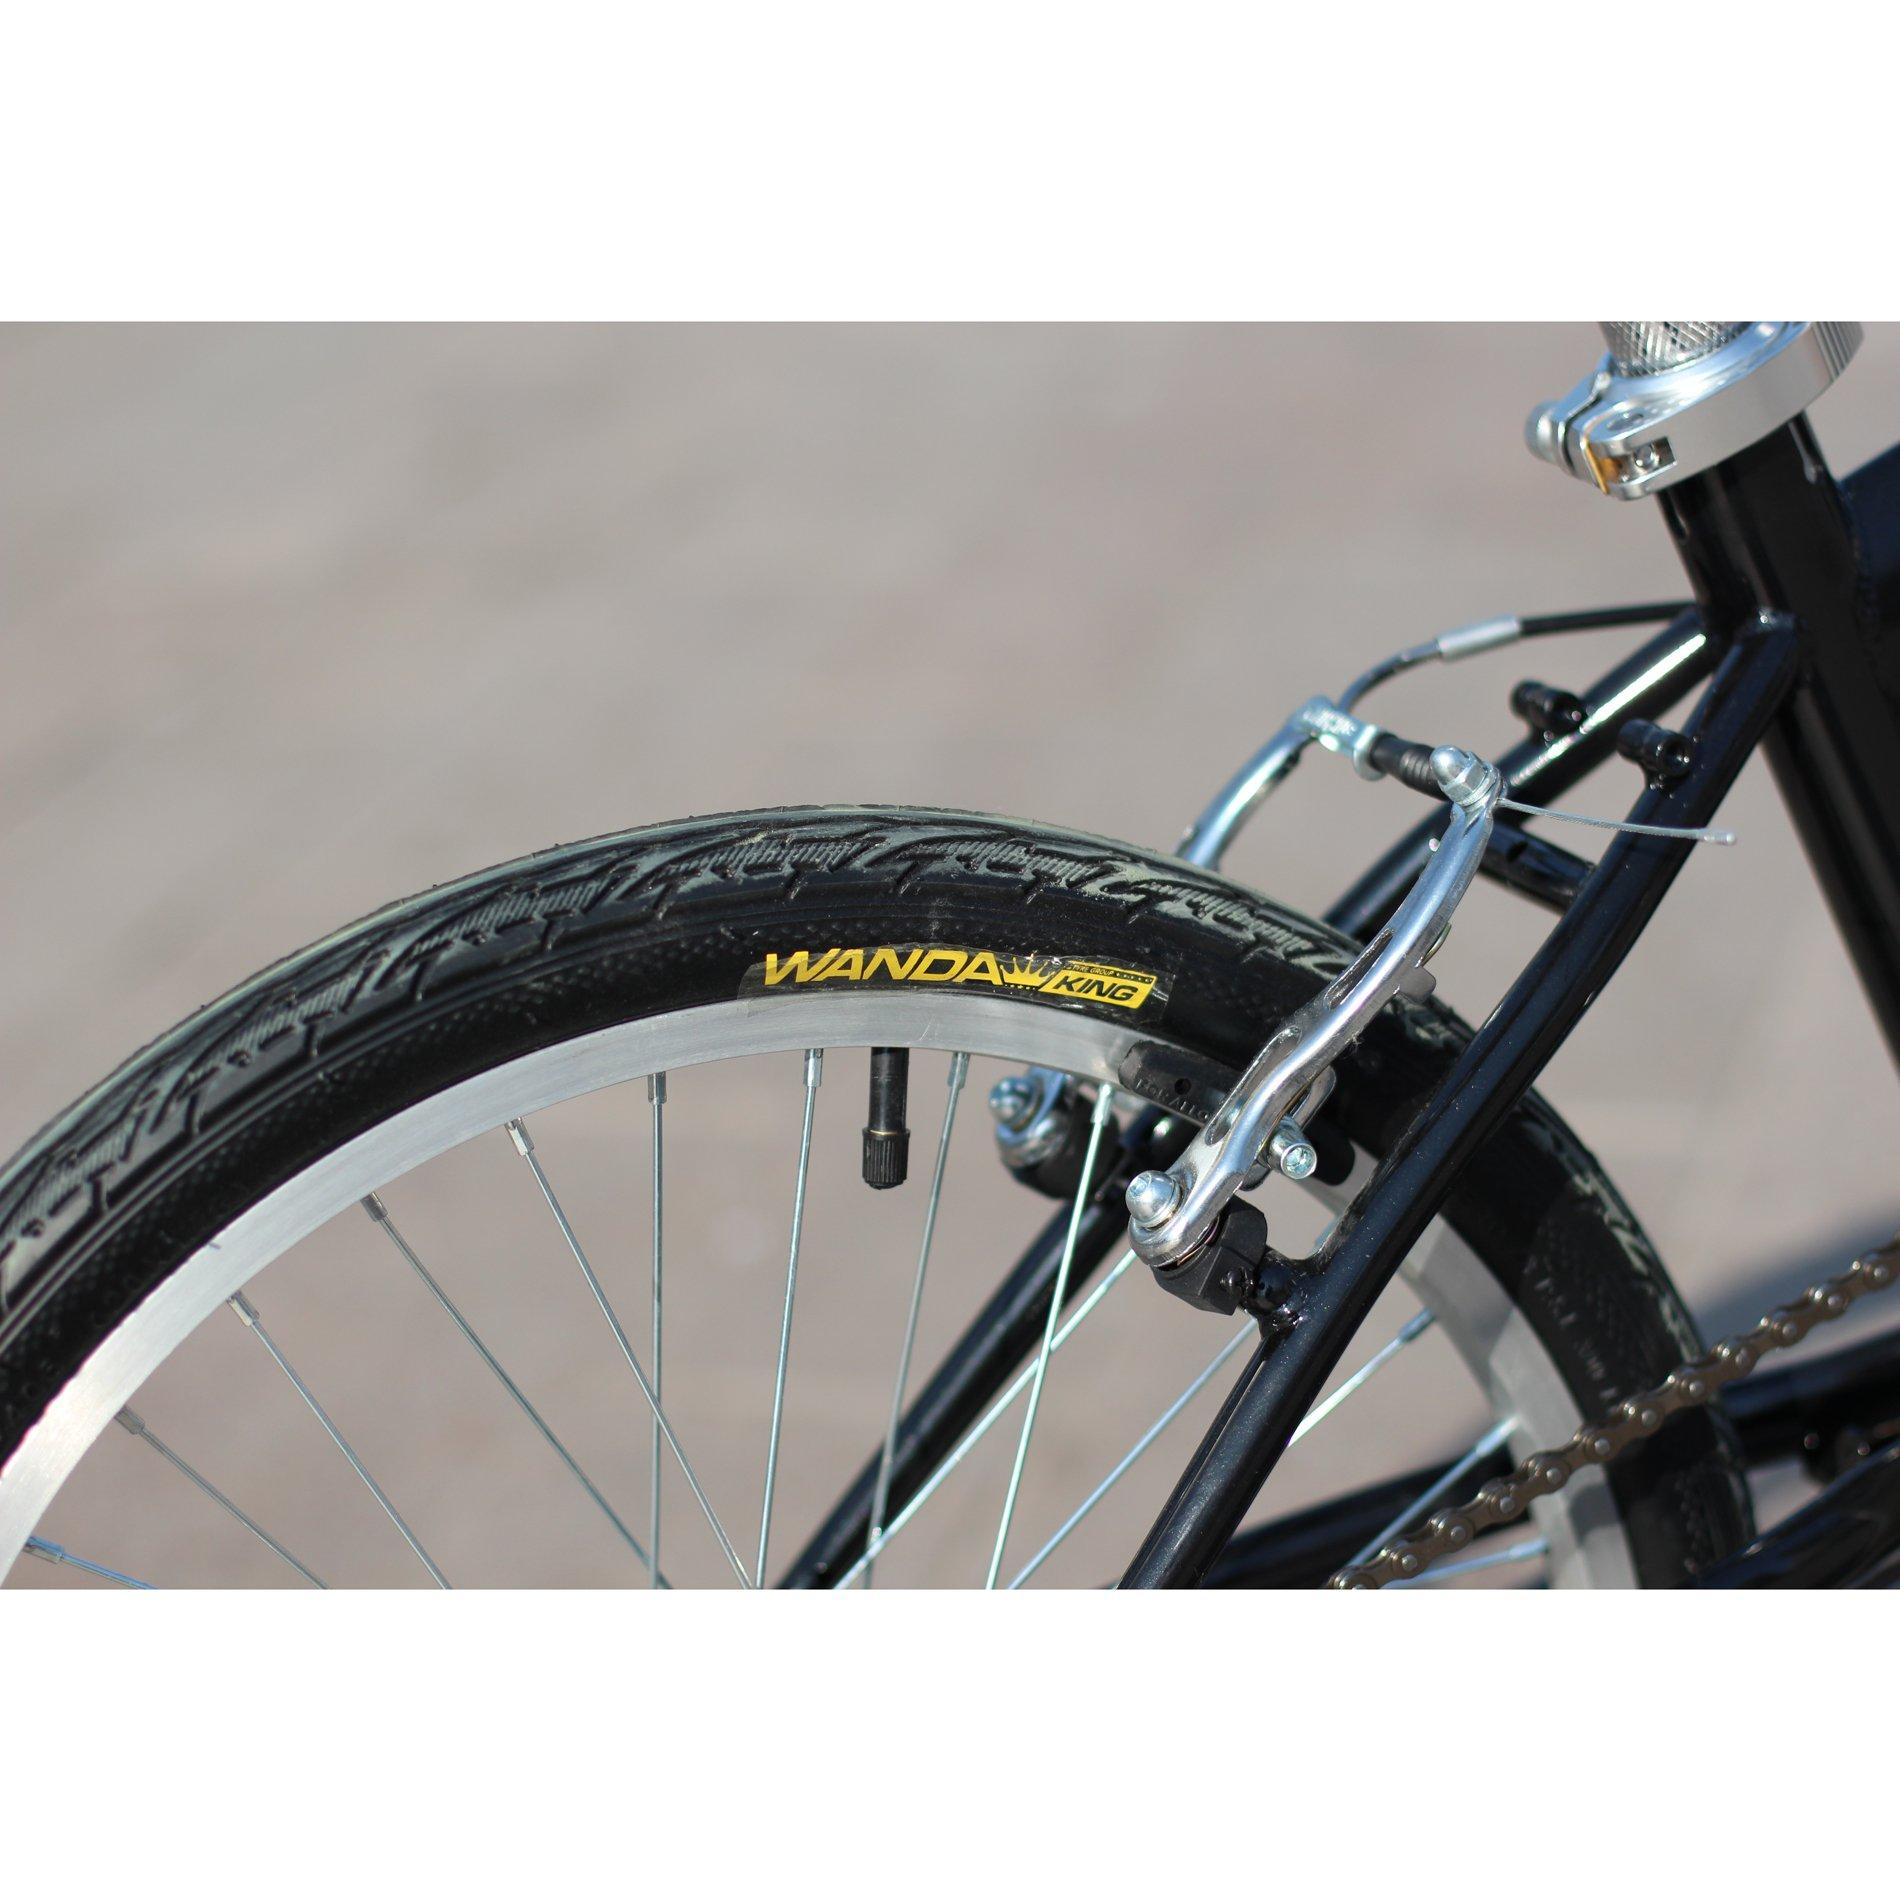 IDS Home Unyousual U Arc Folding City Bike Bicycle 6 Speed Steel Frame Shimano Gear Wanda Tire, Black by IDS Home (Image #5)